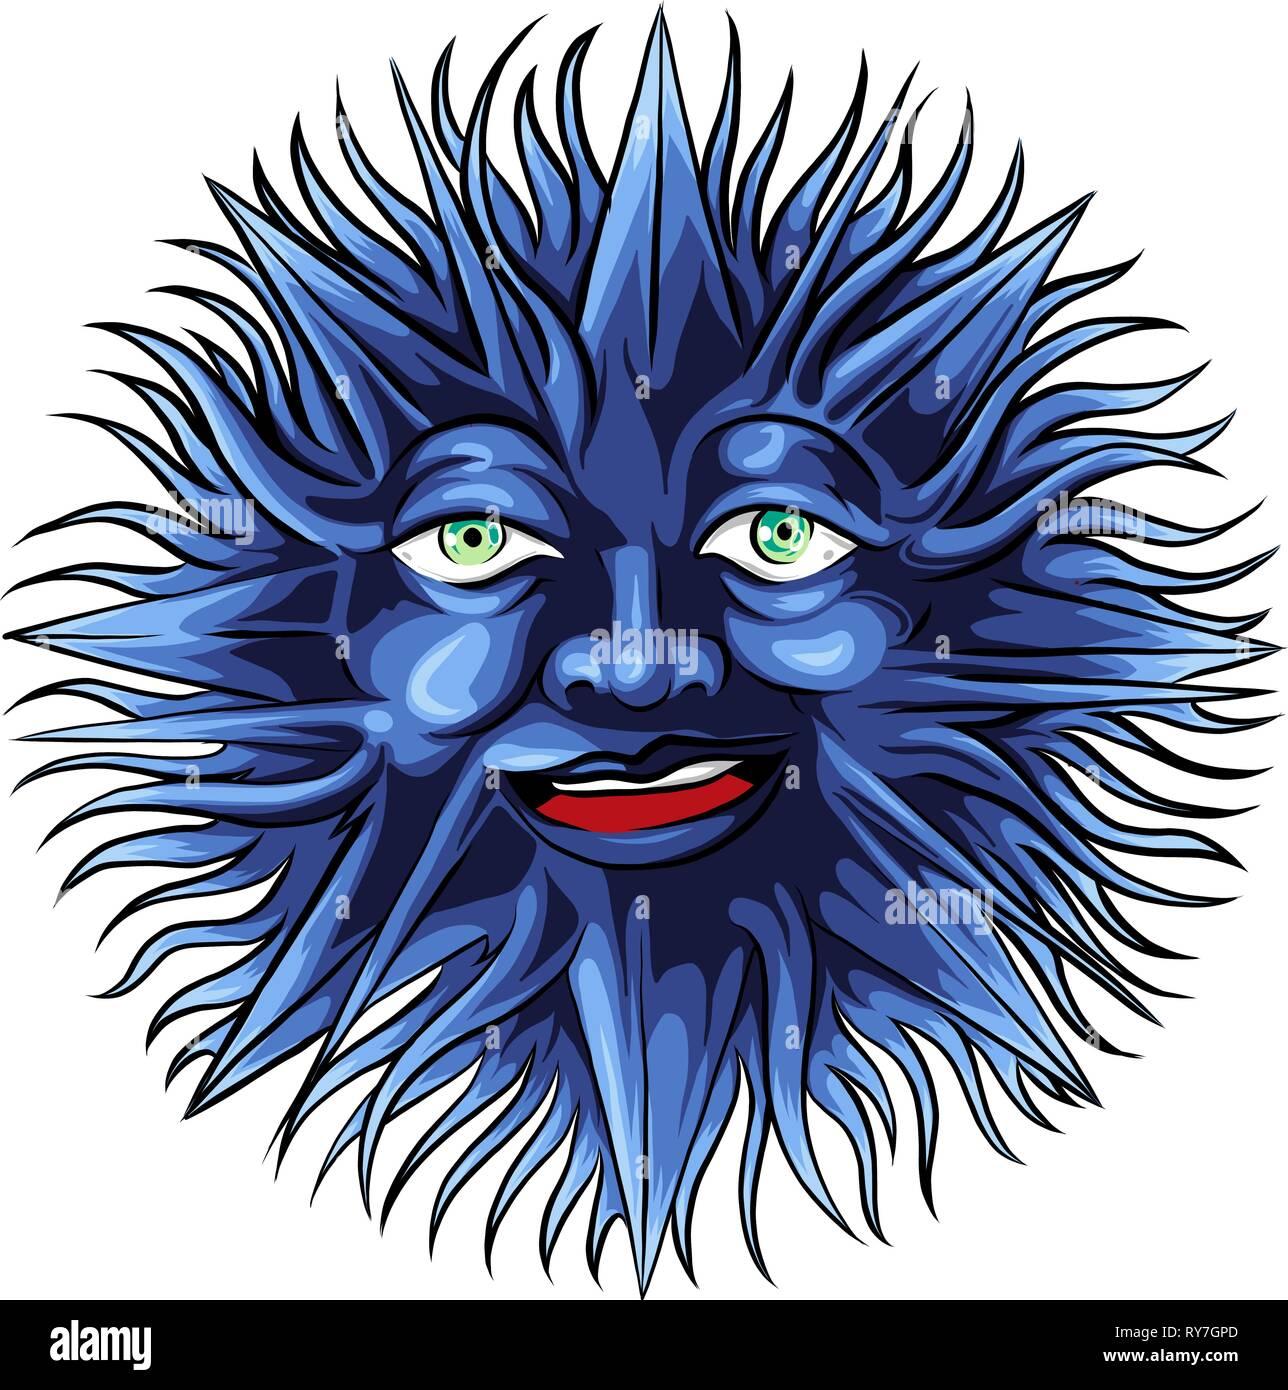 face tattoo of a sun vector illustration - Stock Vector